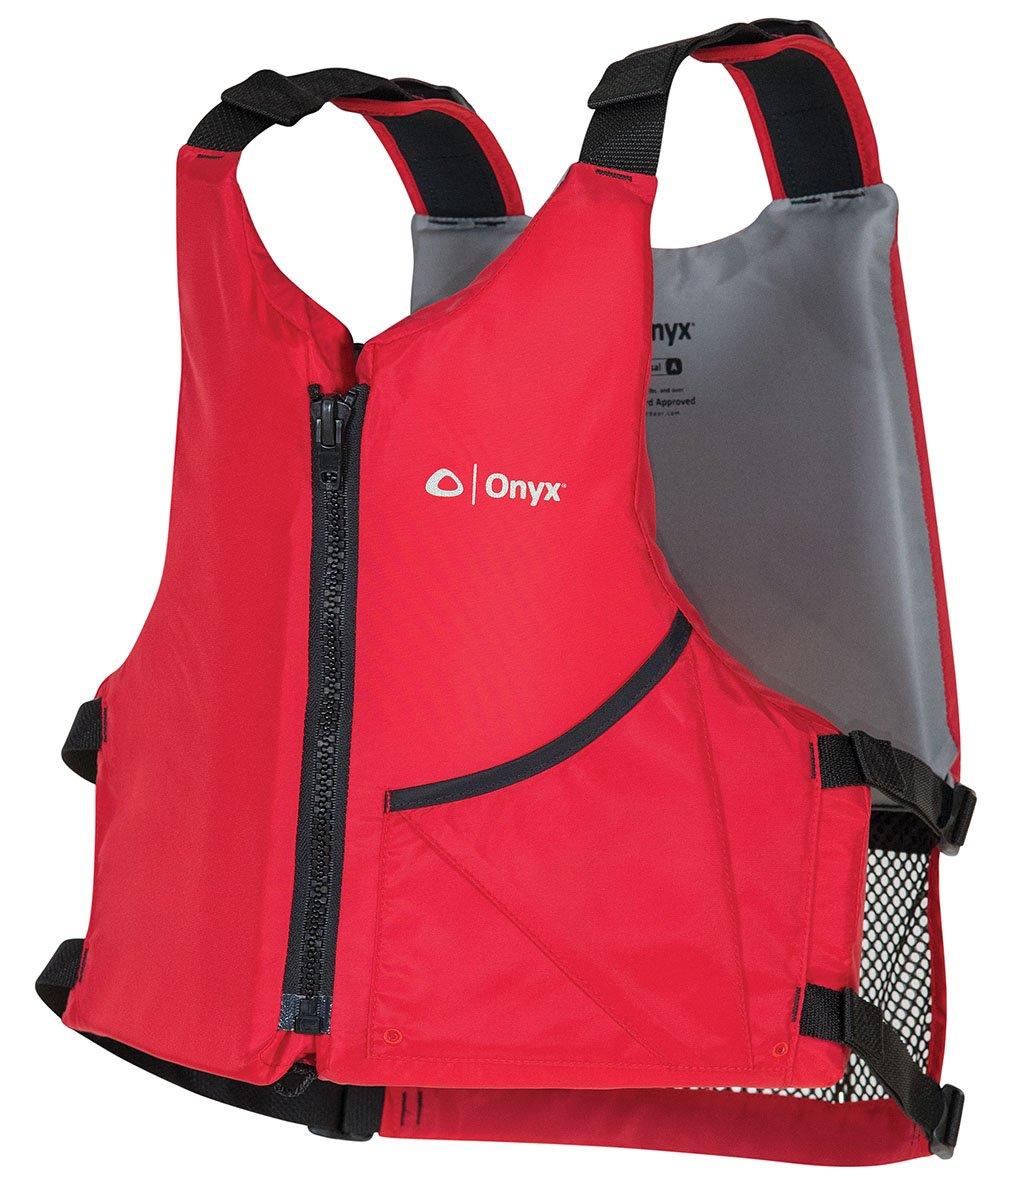 Onyx Universal Paddle Vest Universal Paddle Life Vest, Red, Oversize, by Onyx